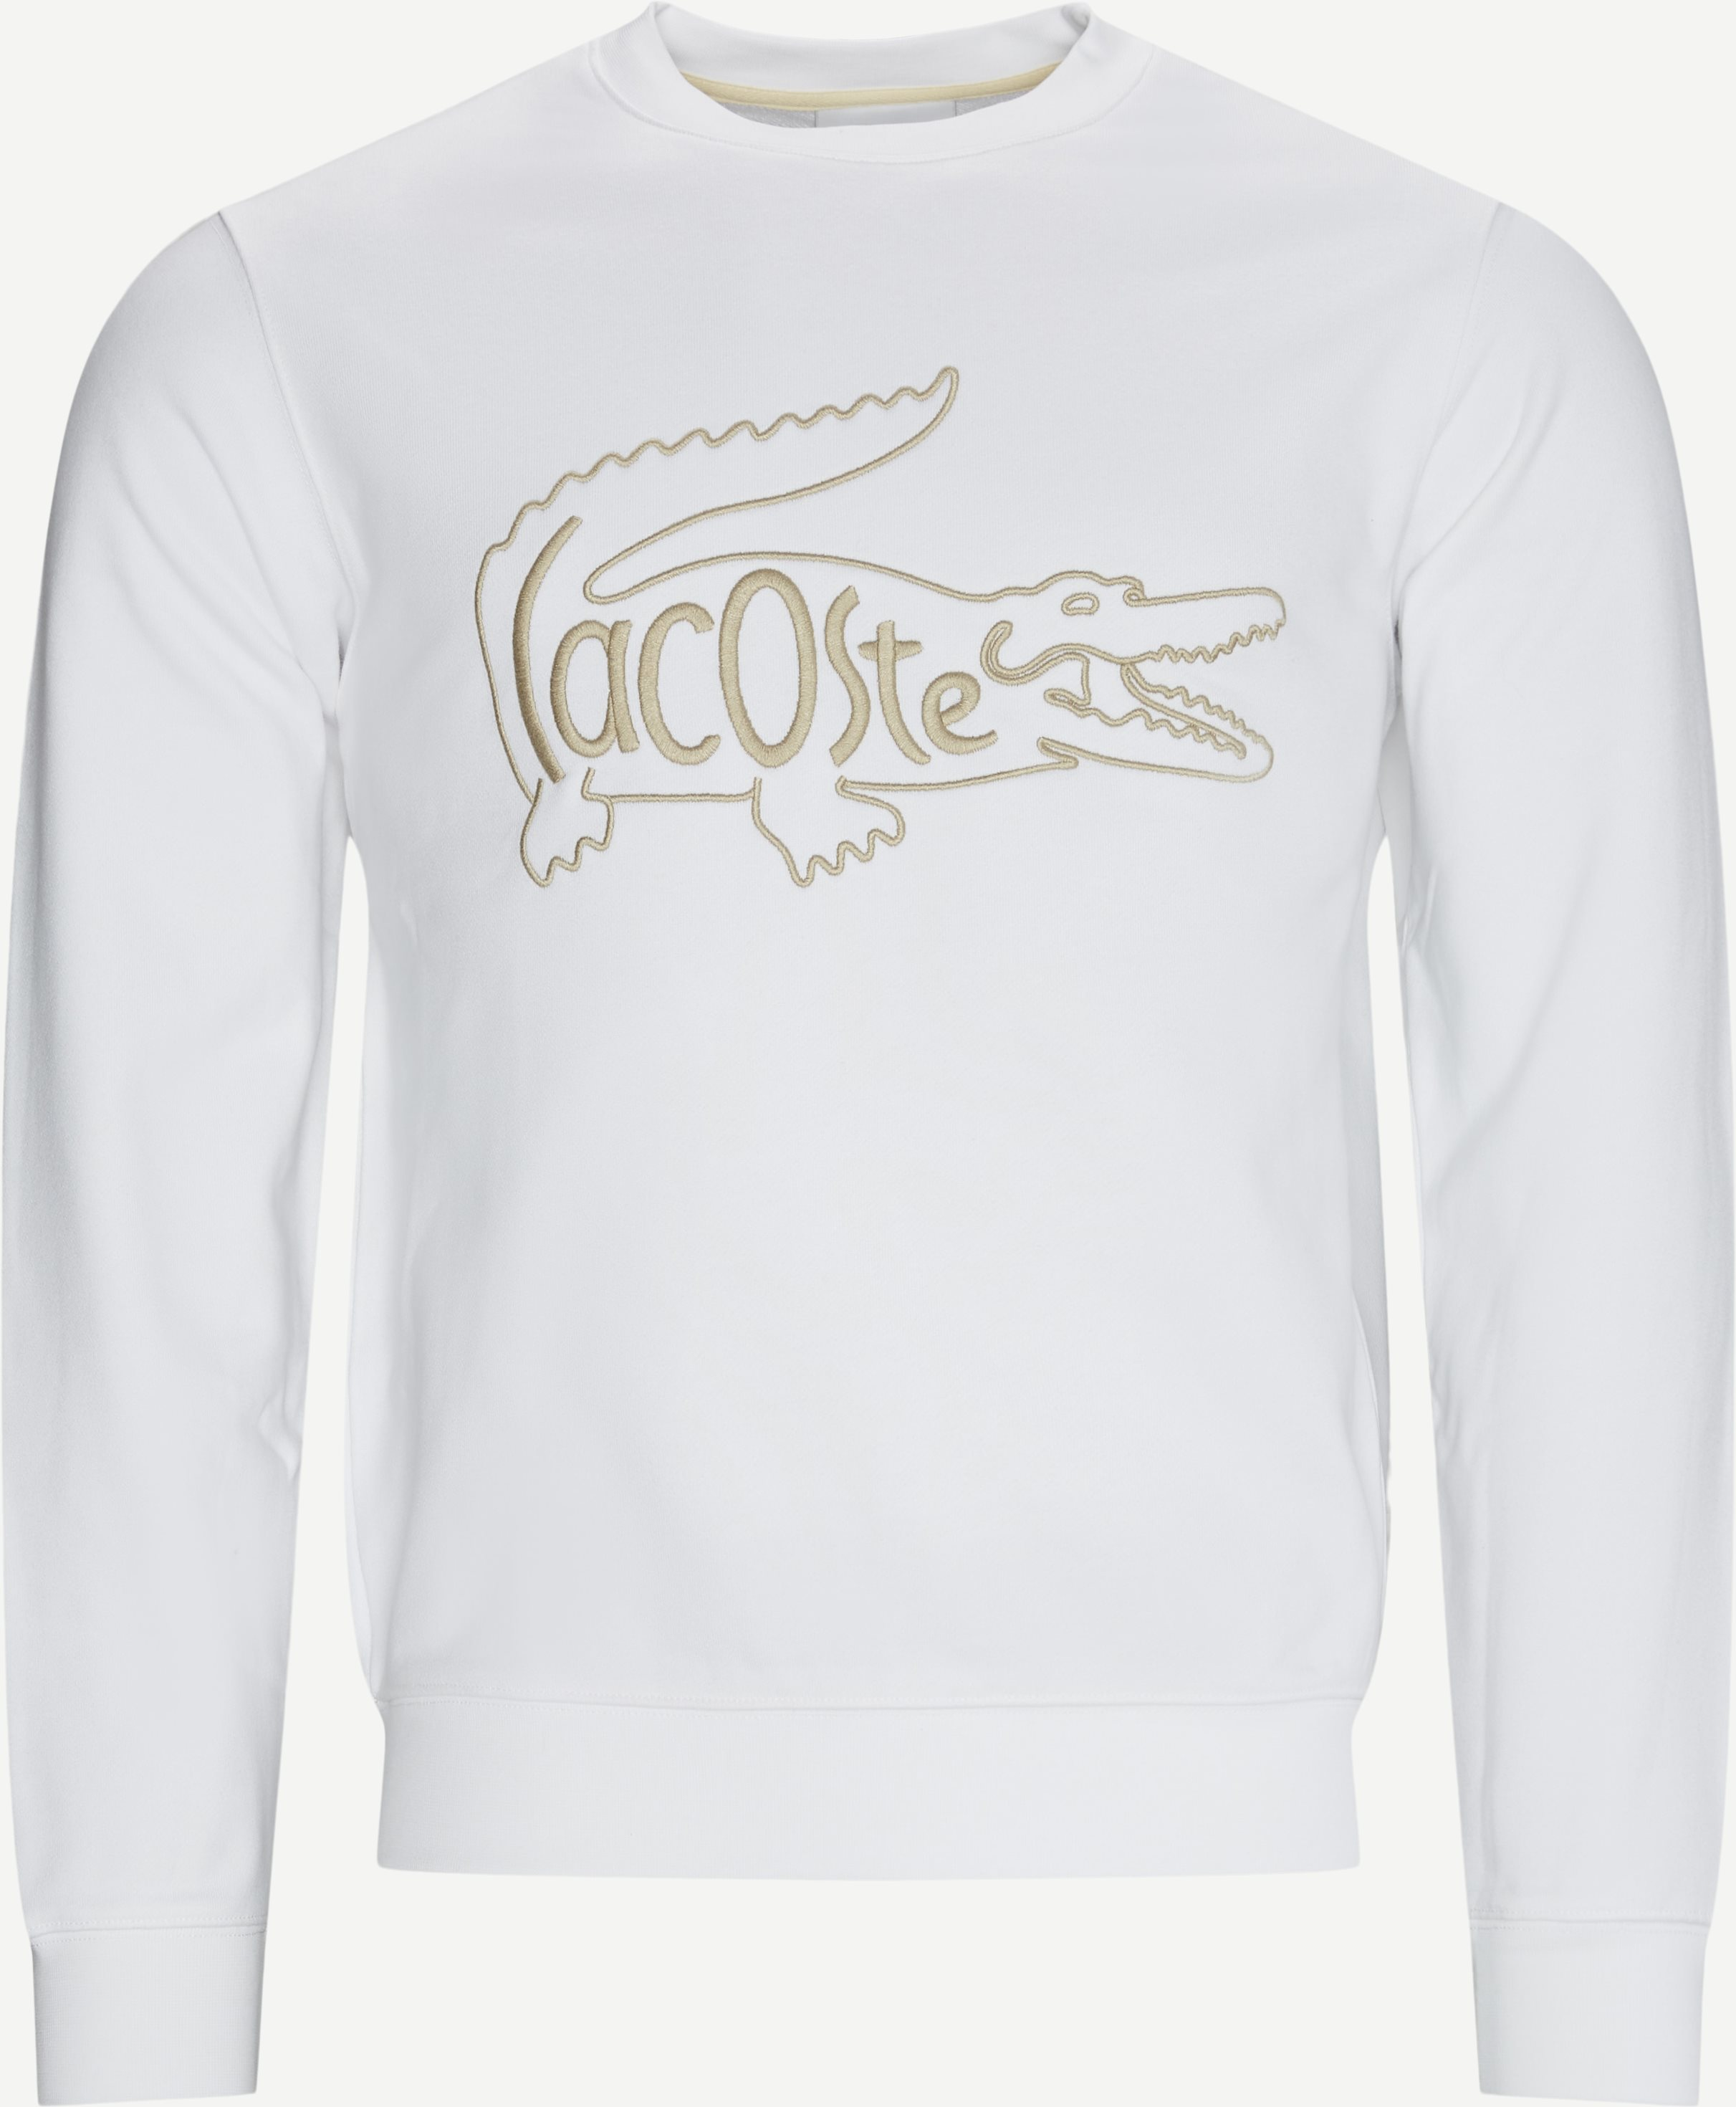 Crewneck Sweatshirt - Sweatshirts - Regular fit - White